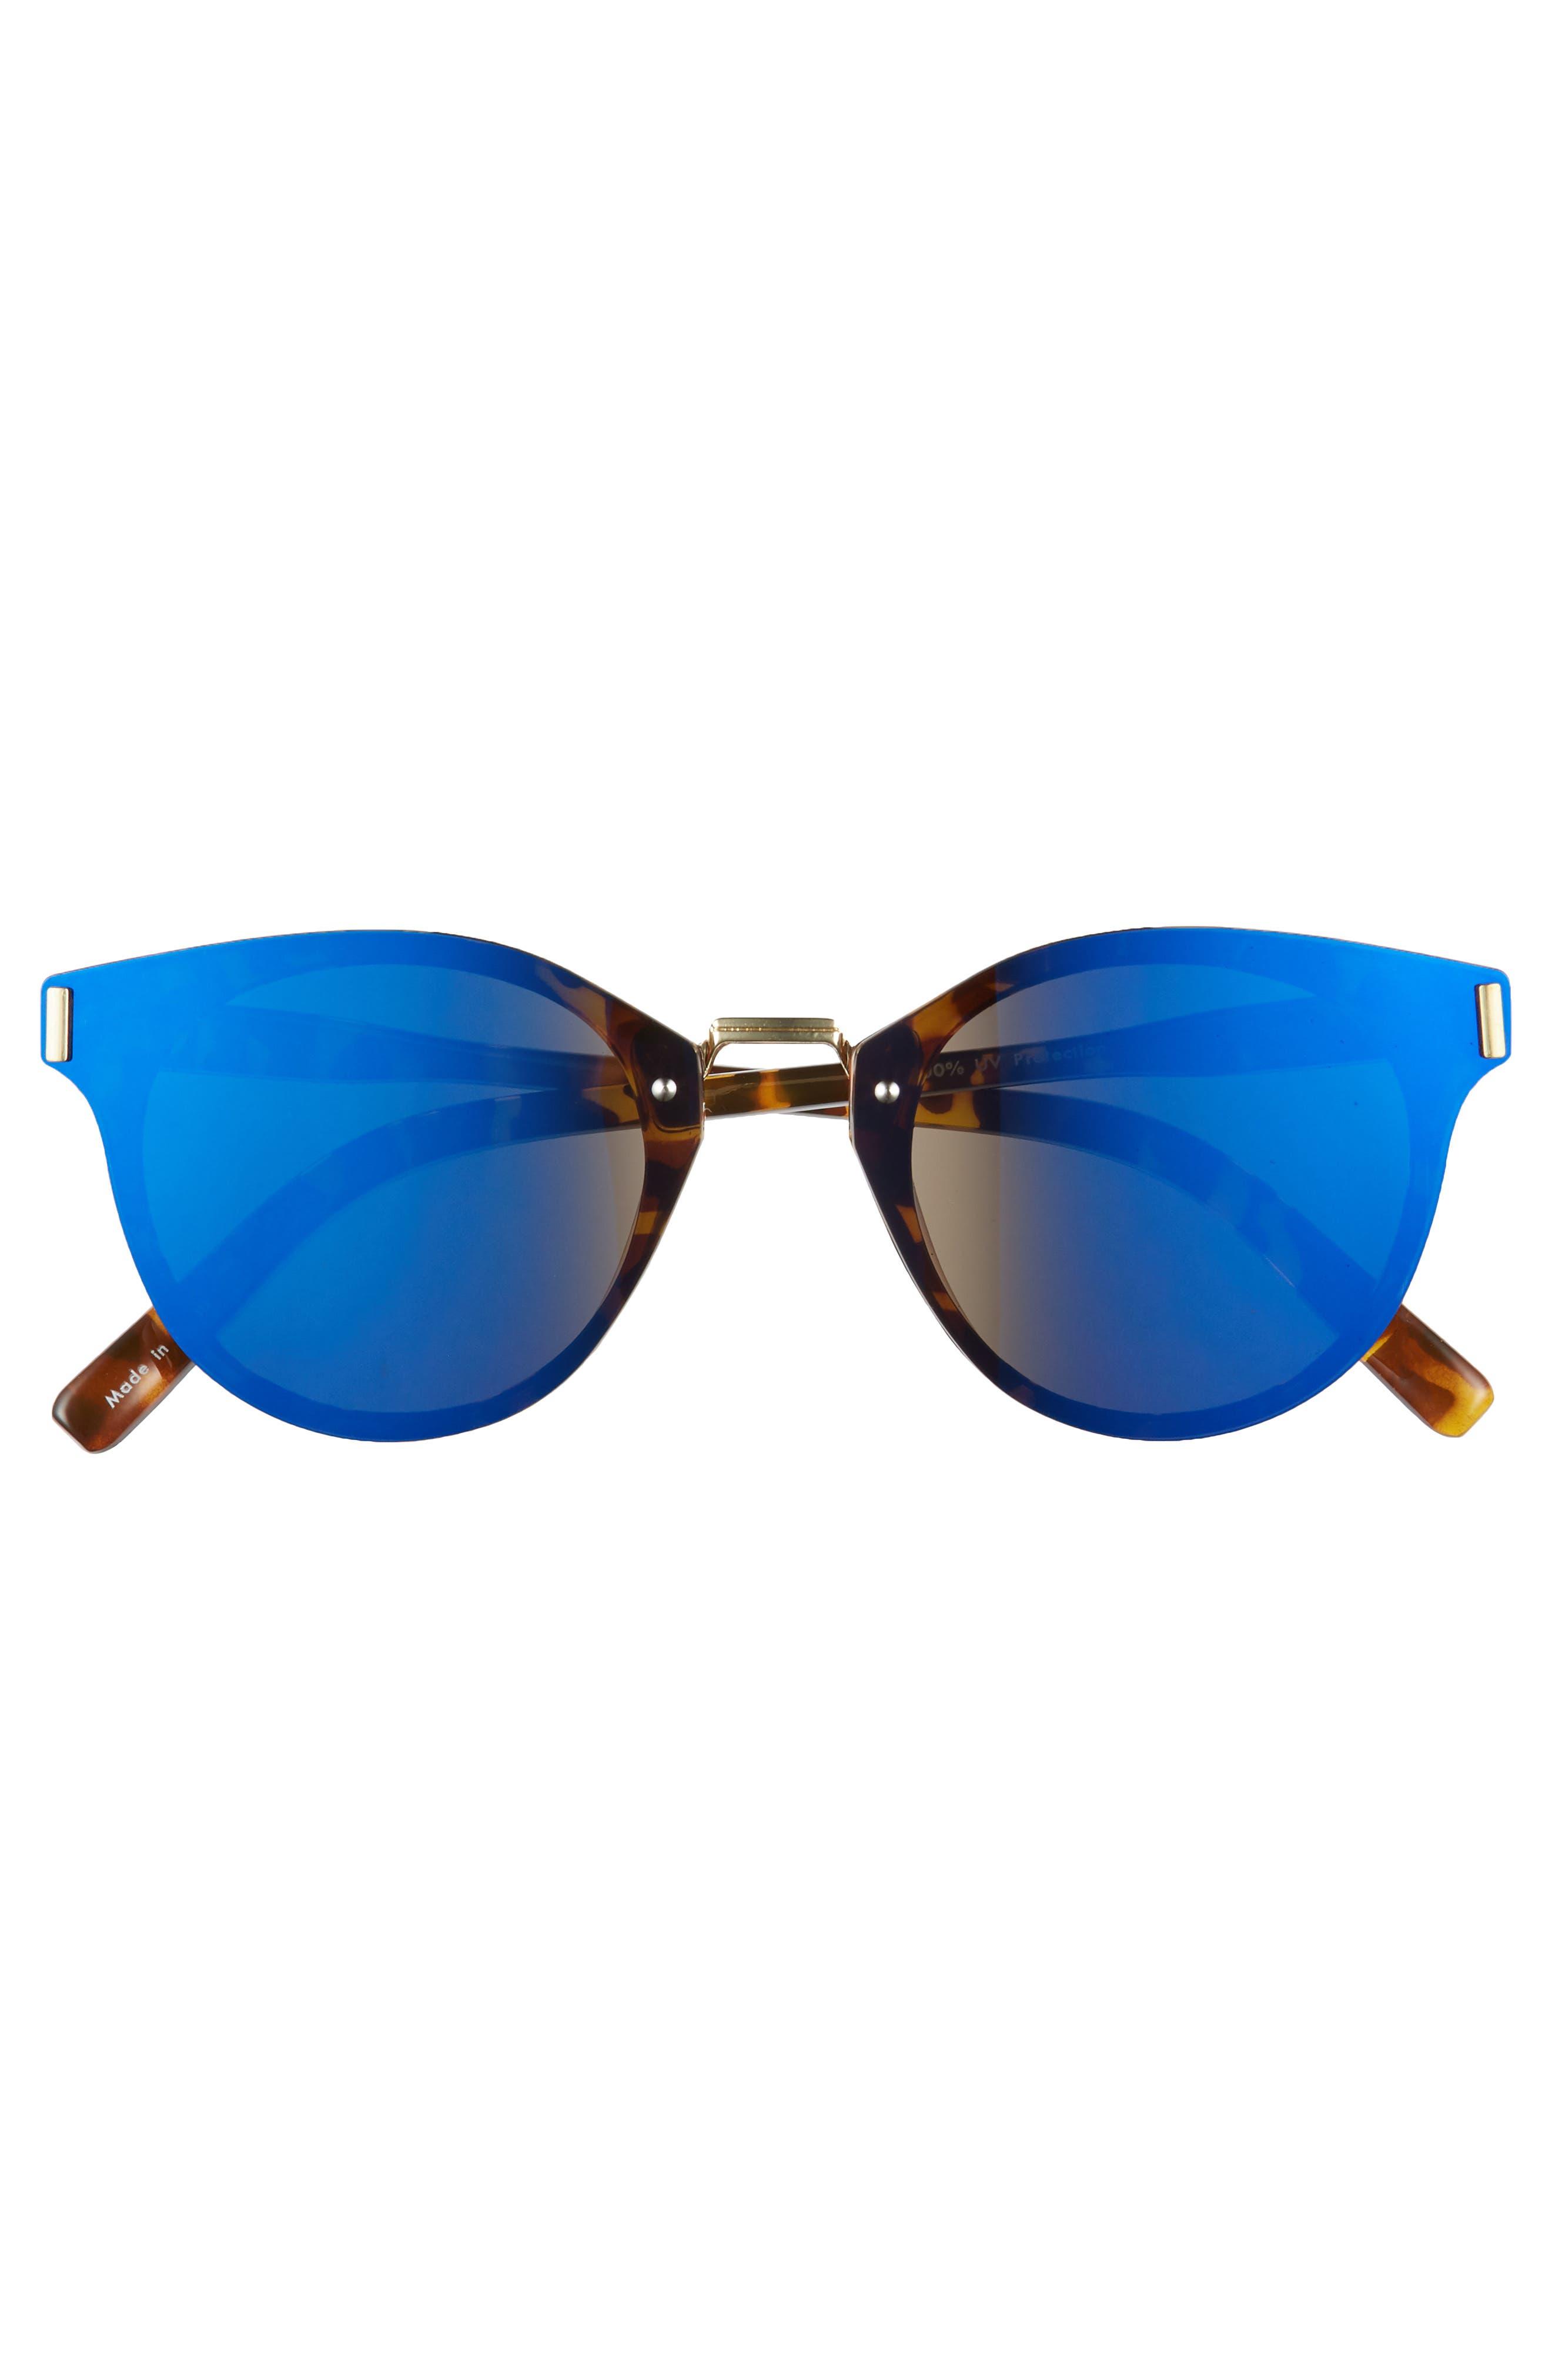 Flat Cat Eye Sunglasses,                             Alternate thumbnail 3, color,                             200